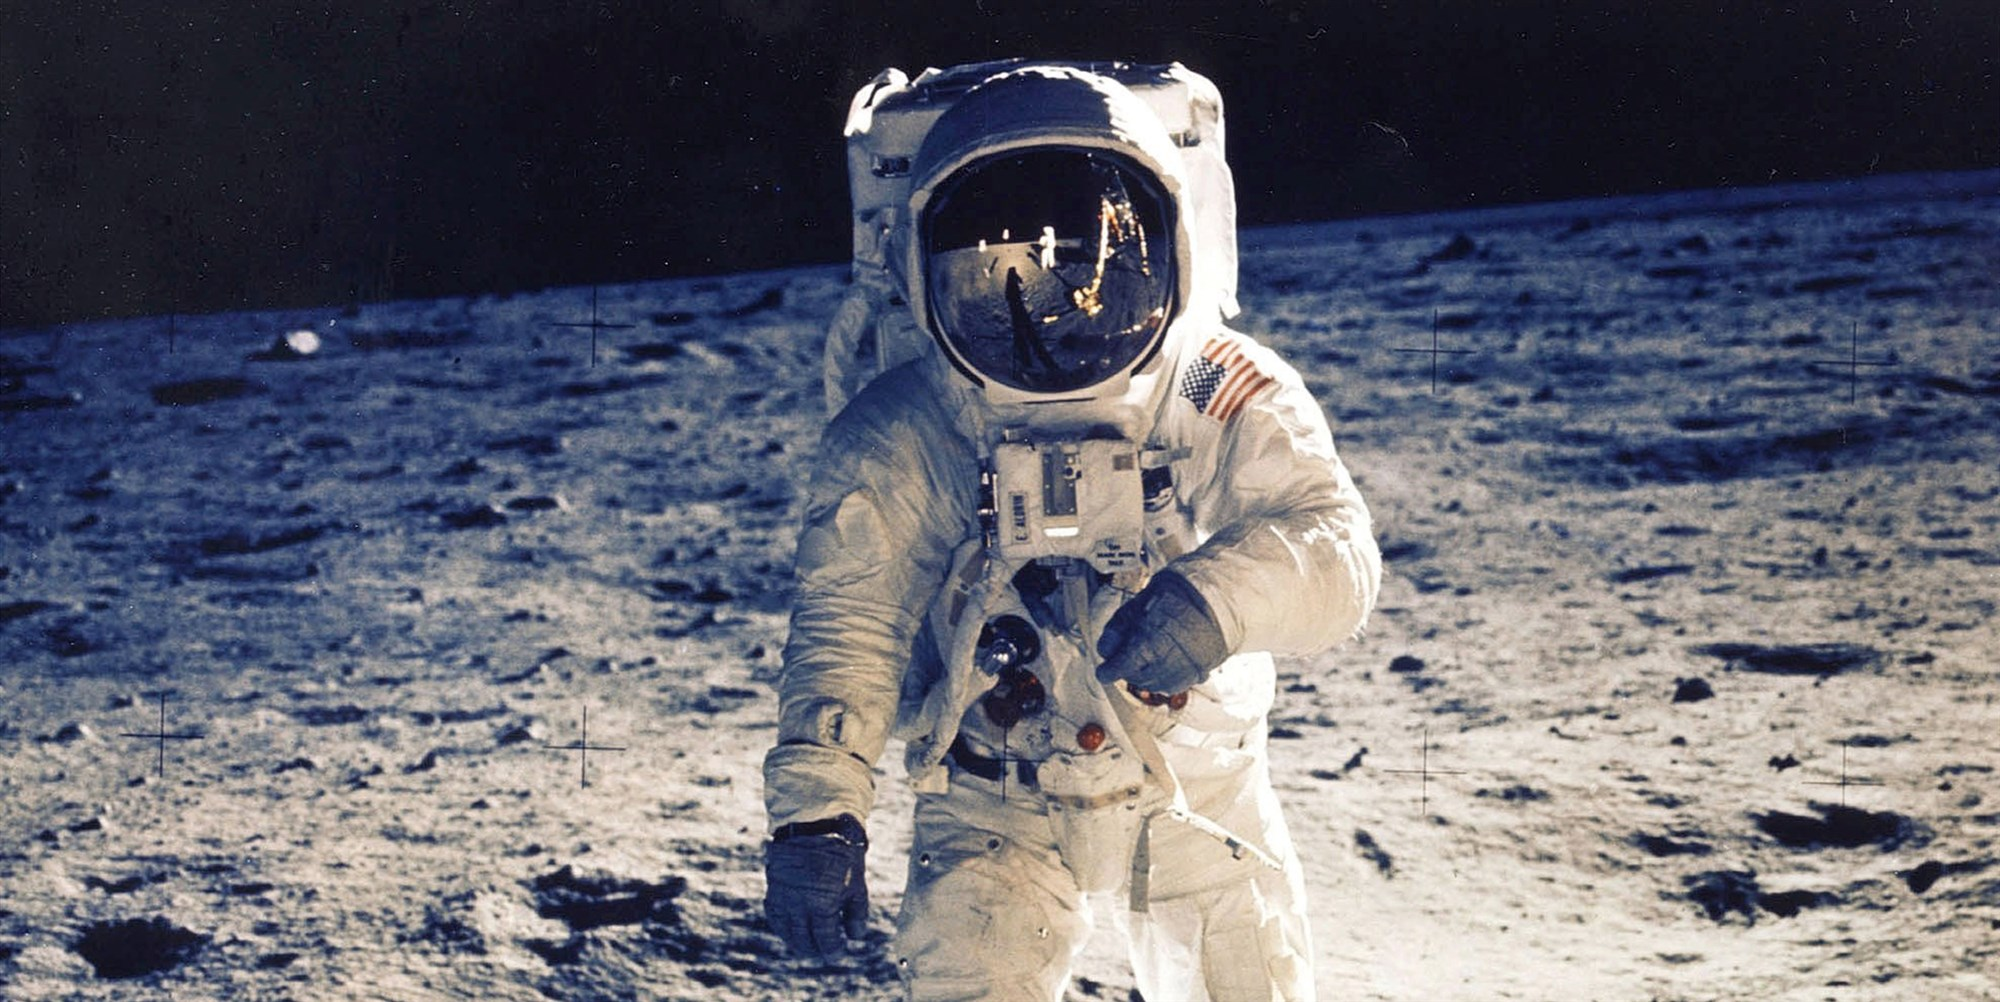 180614-moon-landing-main-art-mn-1320_0e52324668308de1049c41bf173d780a.fit-2000w_1528999962890.jpg